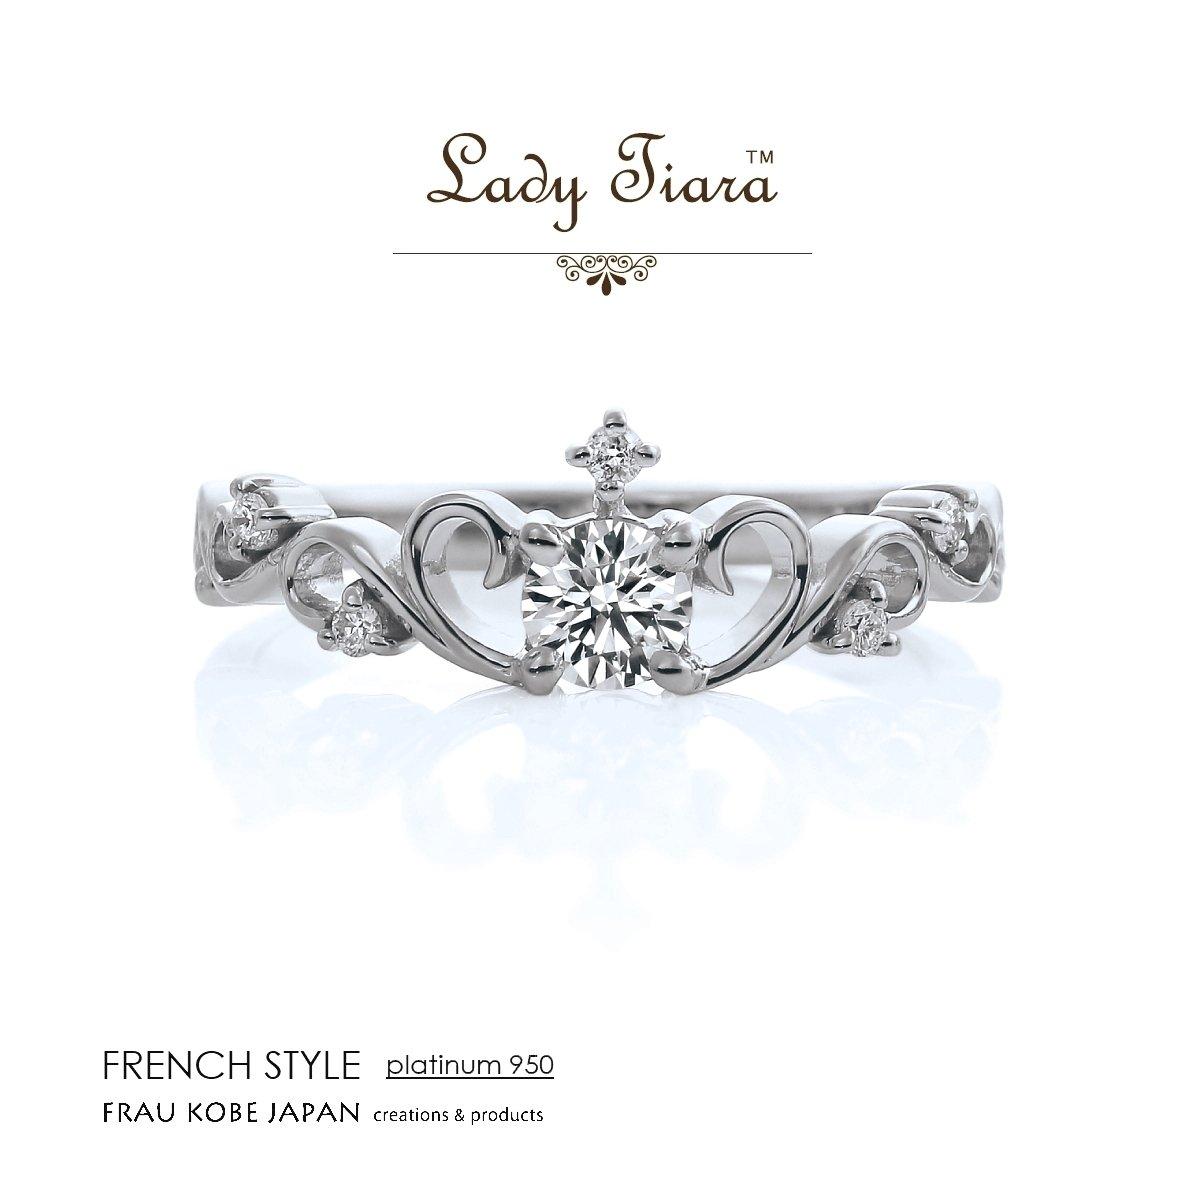 Lady Tiara / フレンチスタイル ダイアモンドリング